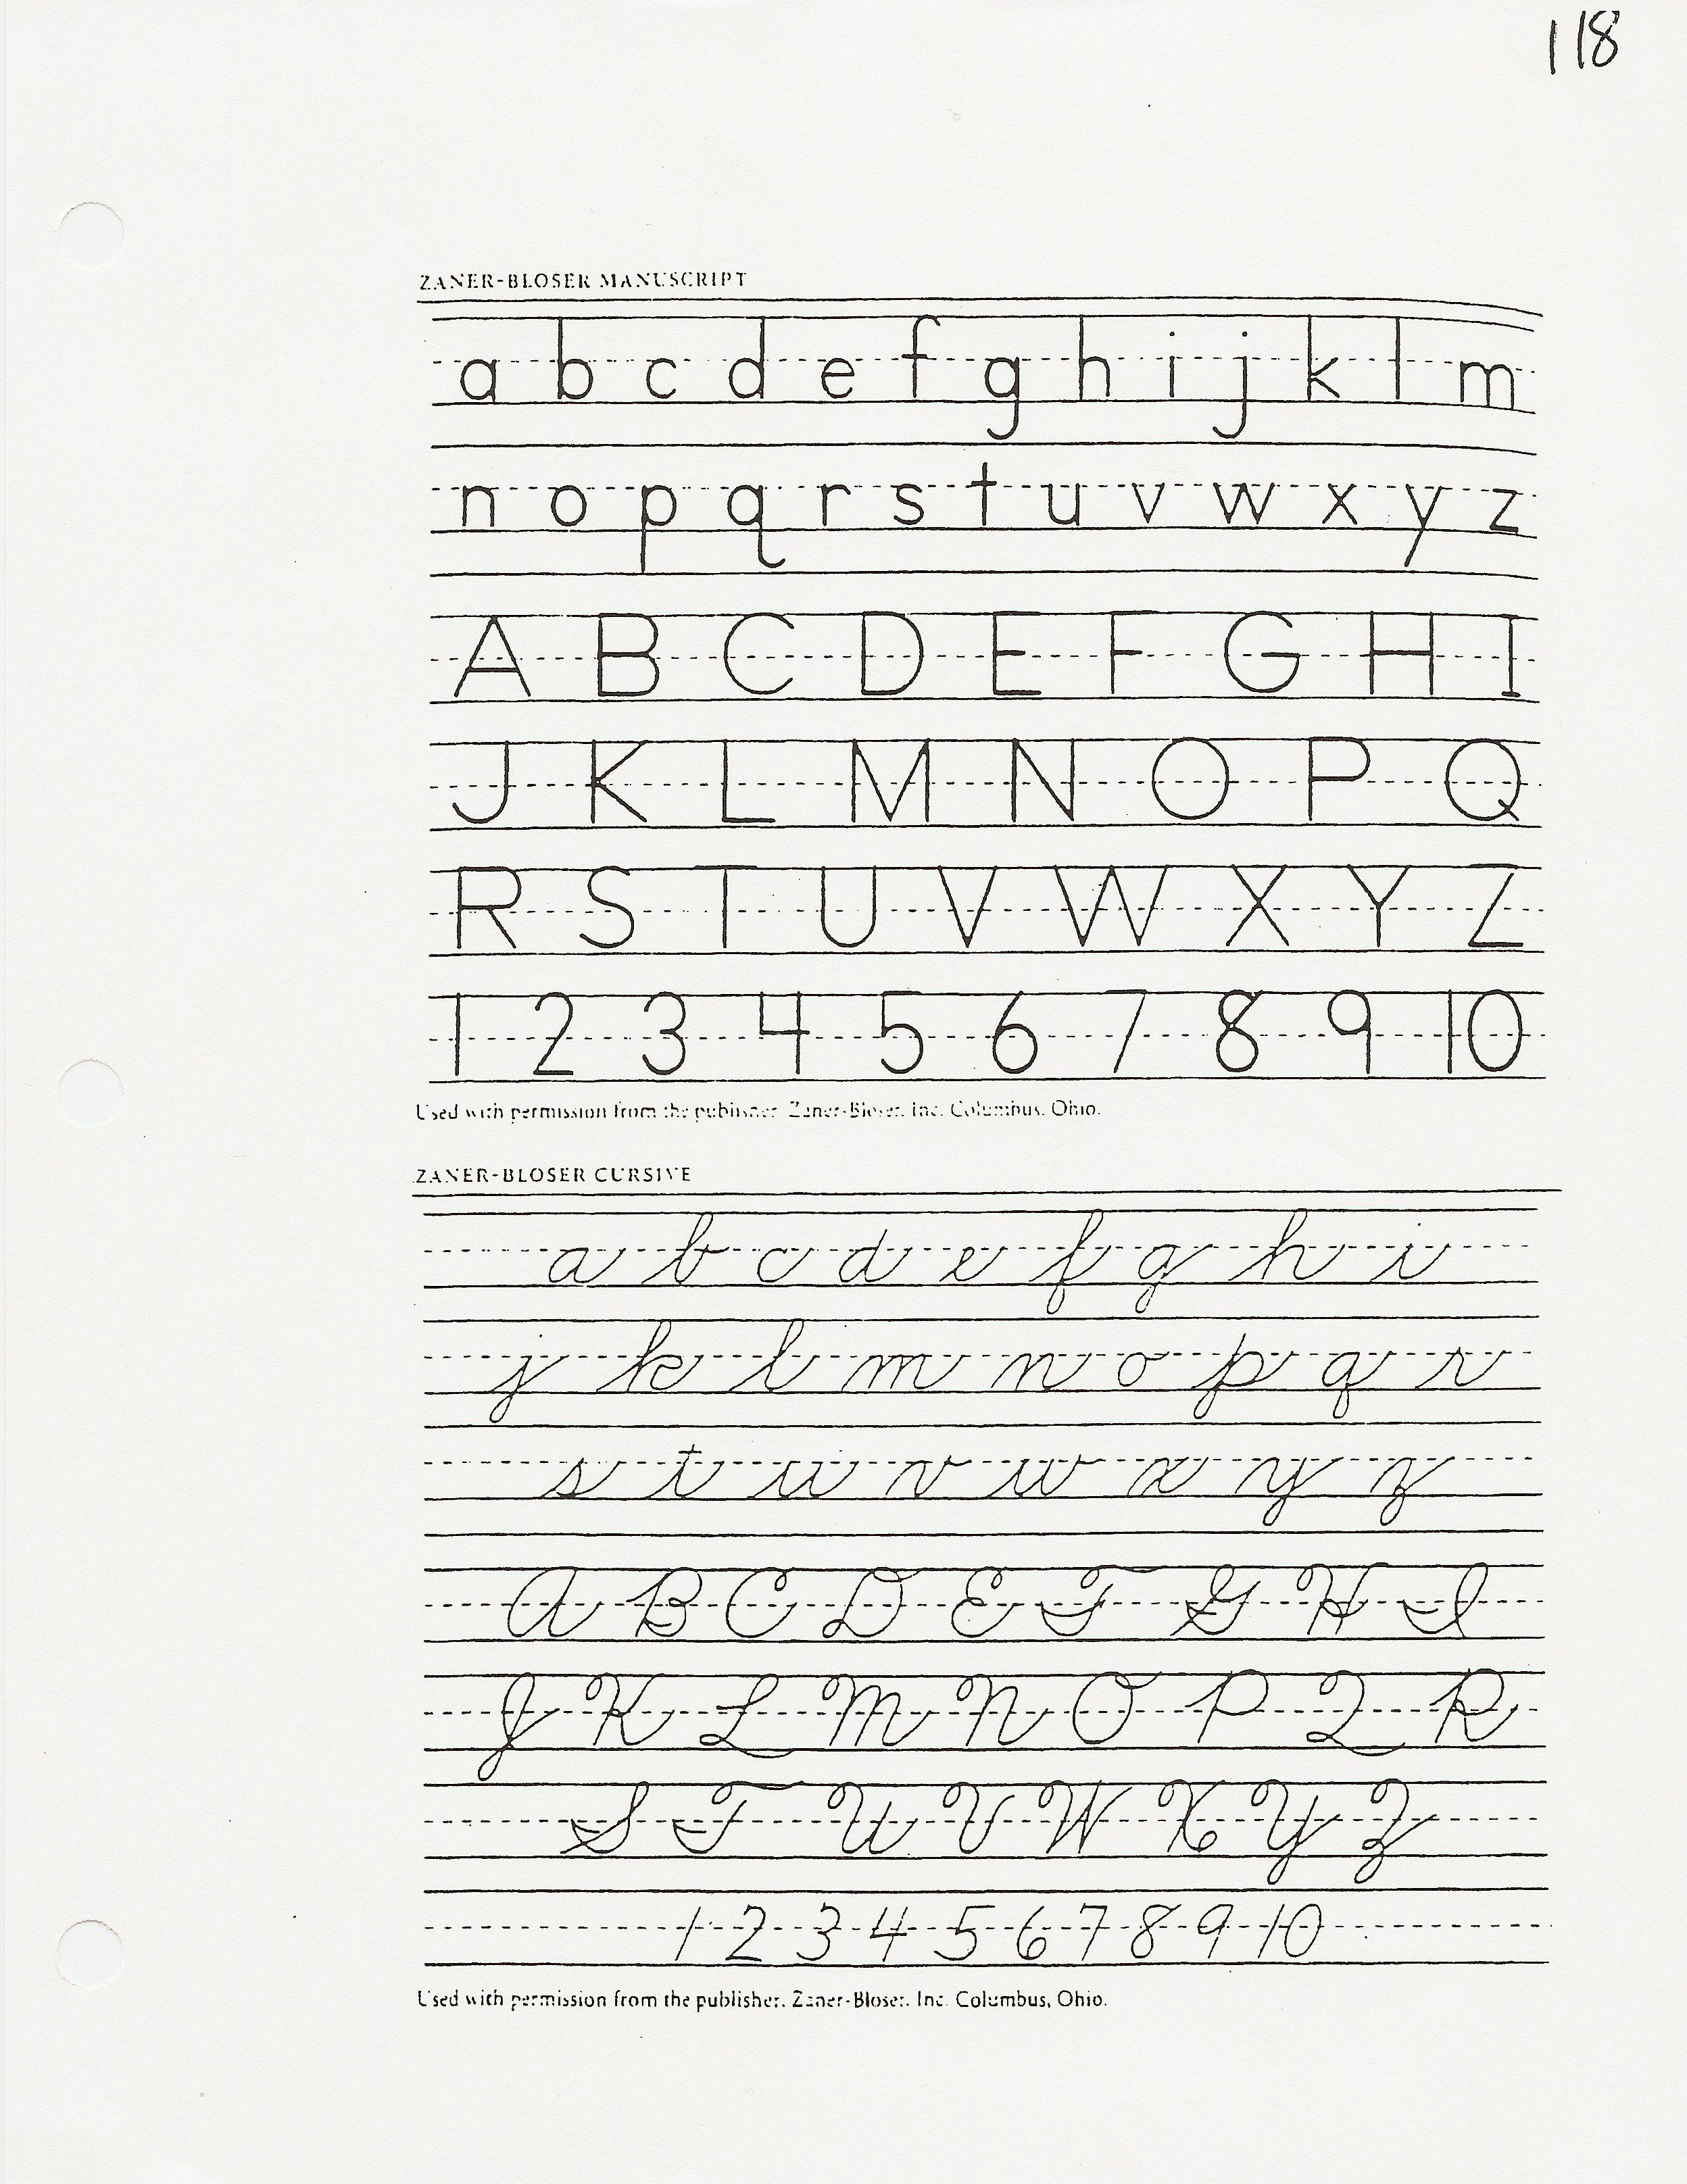 Worksheets Zaner Bloser Handwriting Worksheets zaner bloser handwriting paper paper